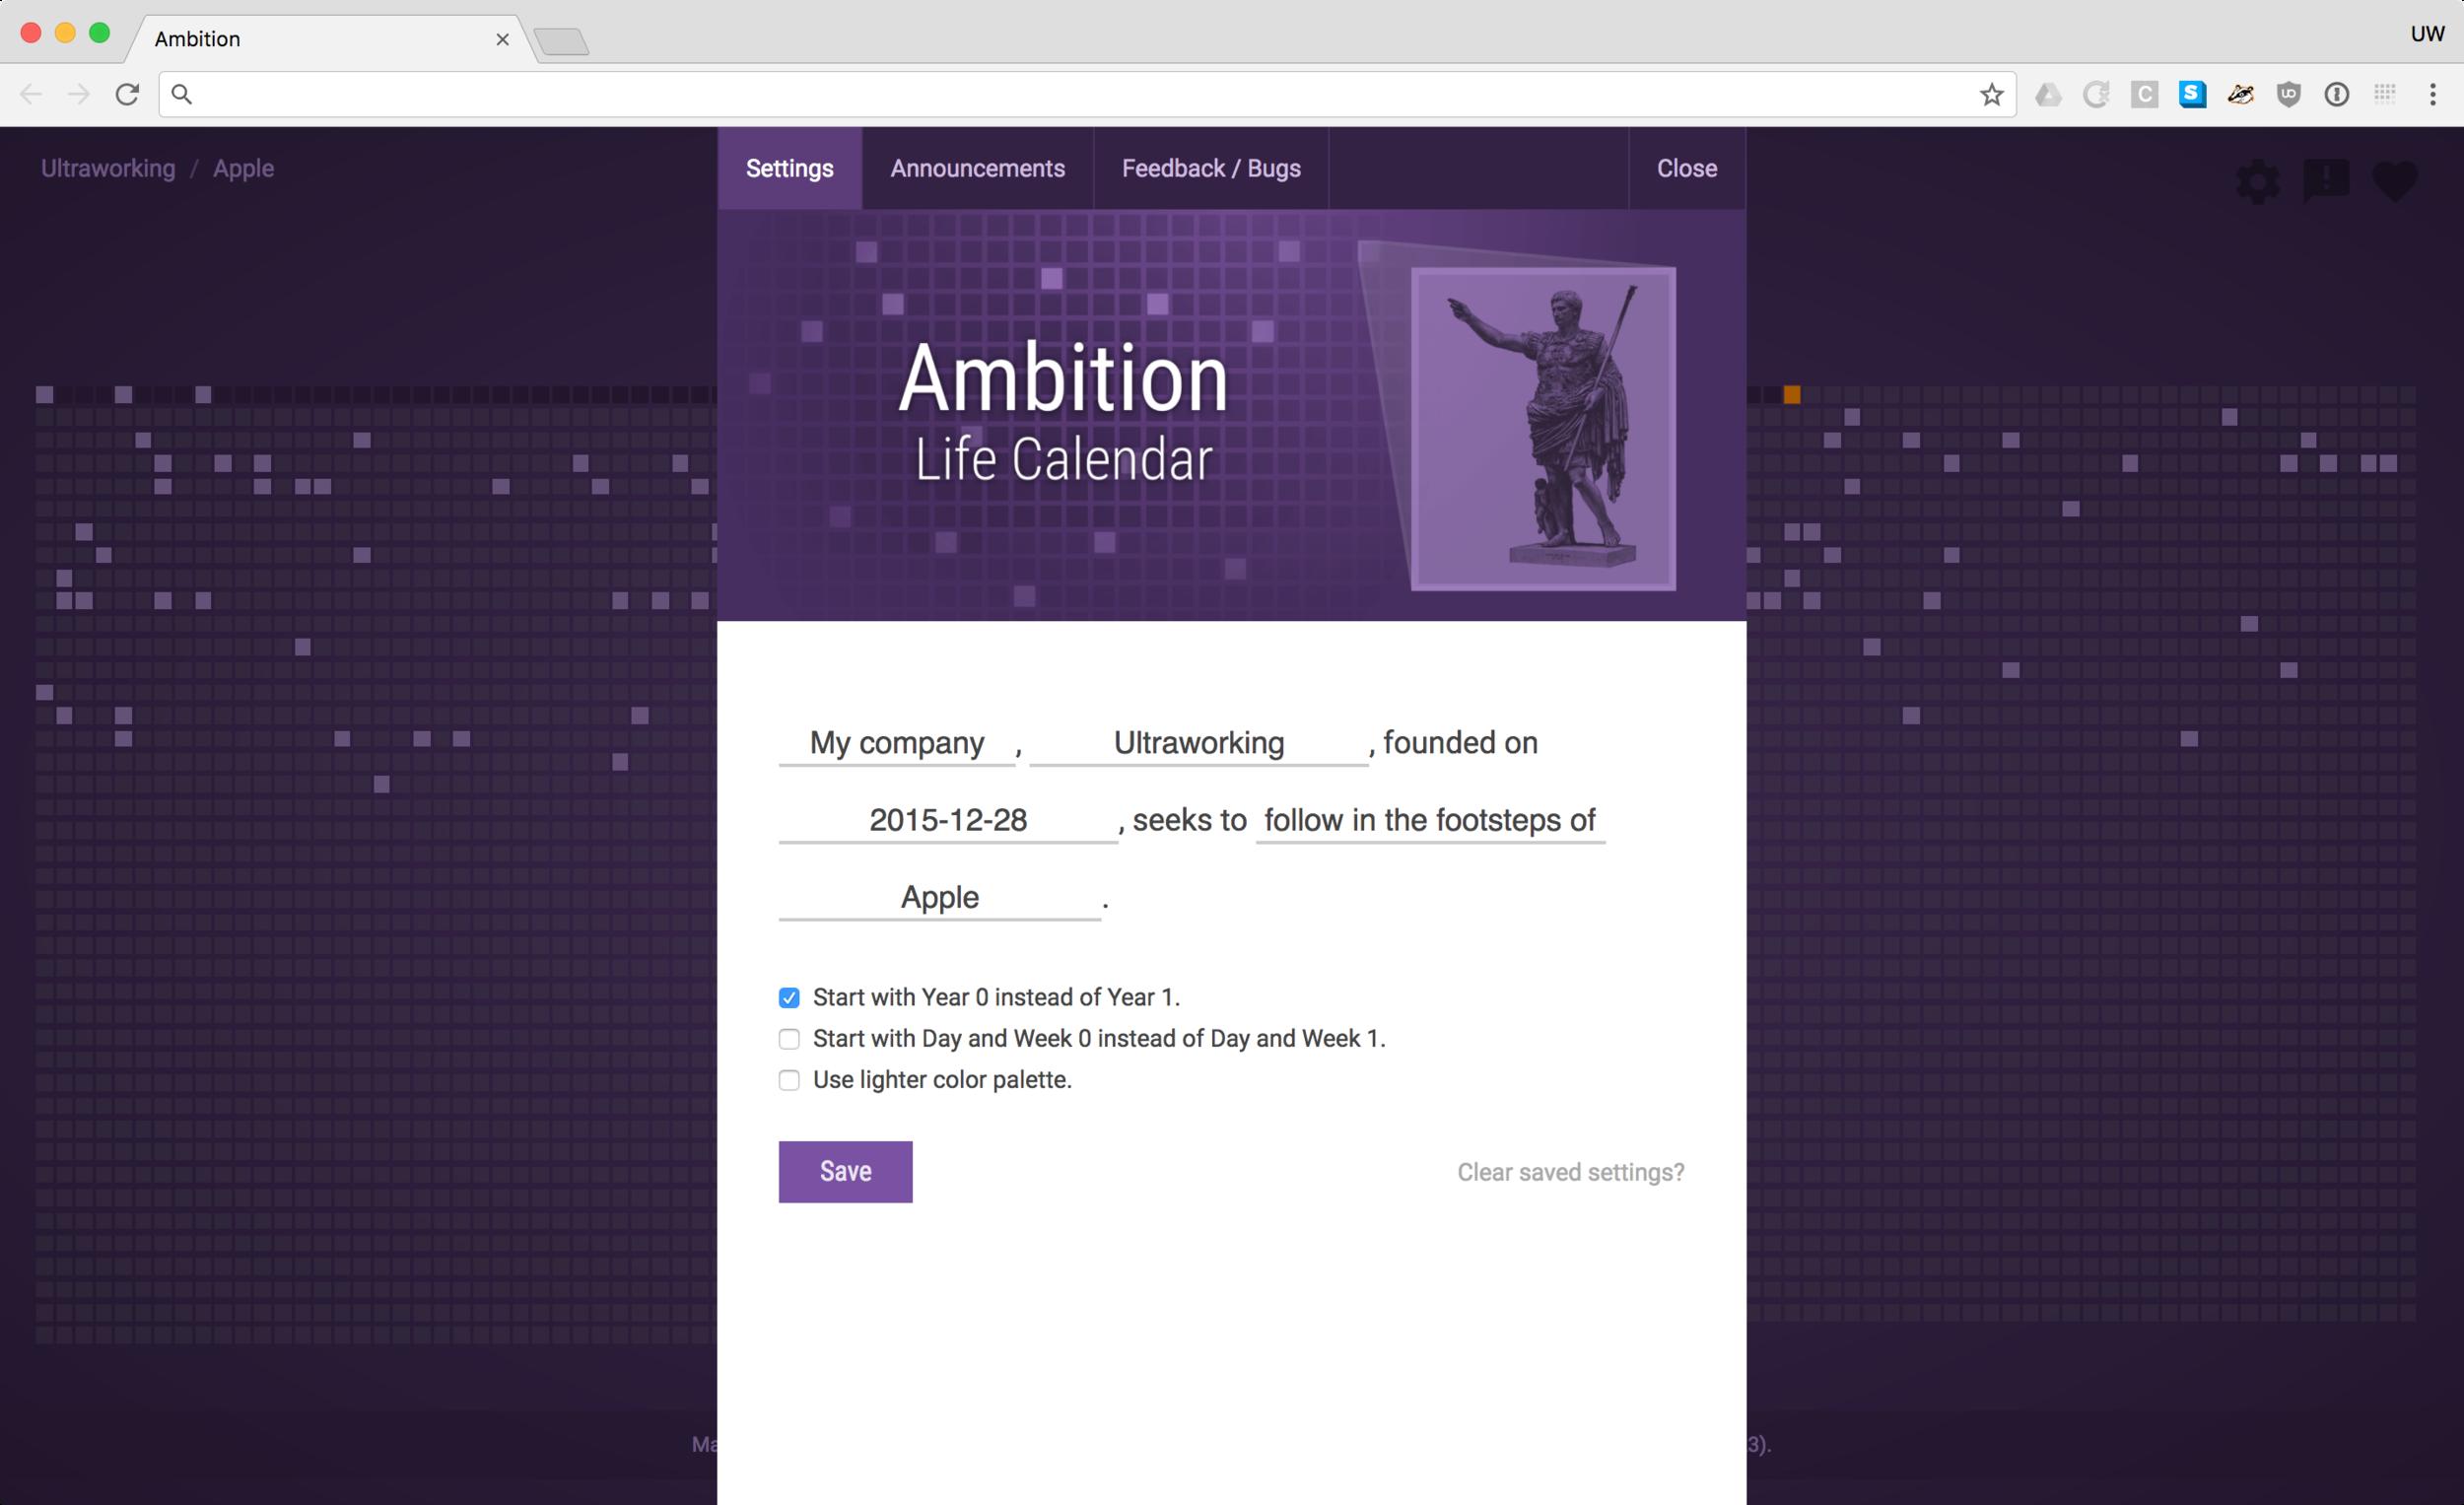 ambition-screenshot.png